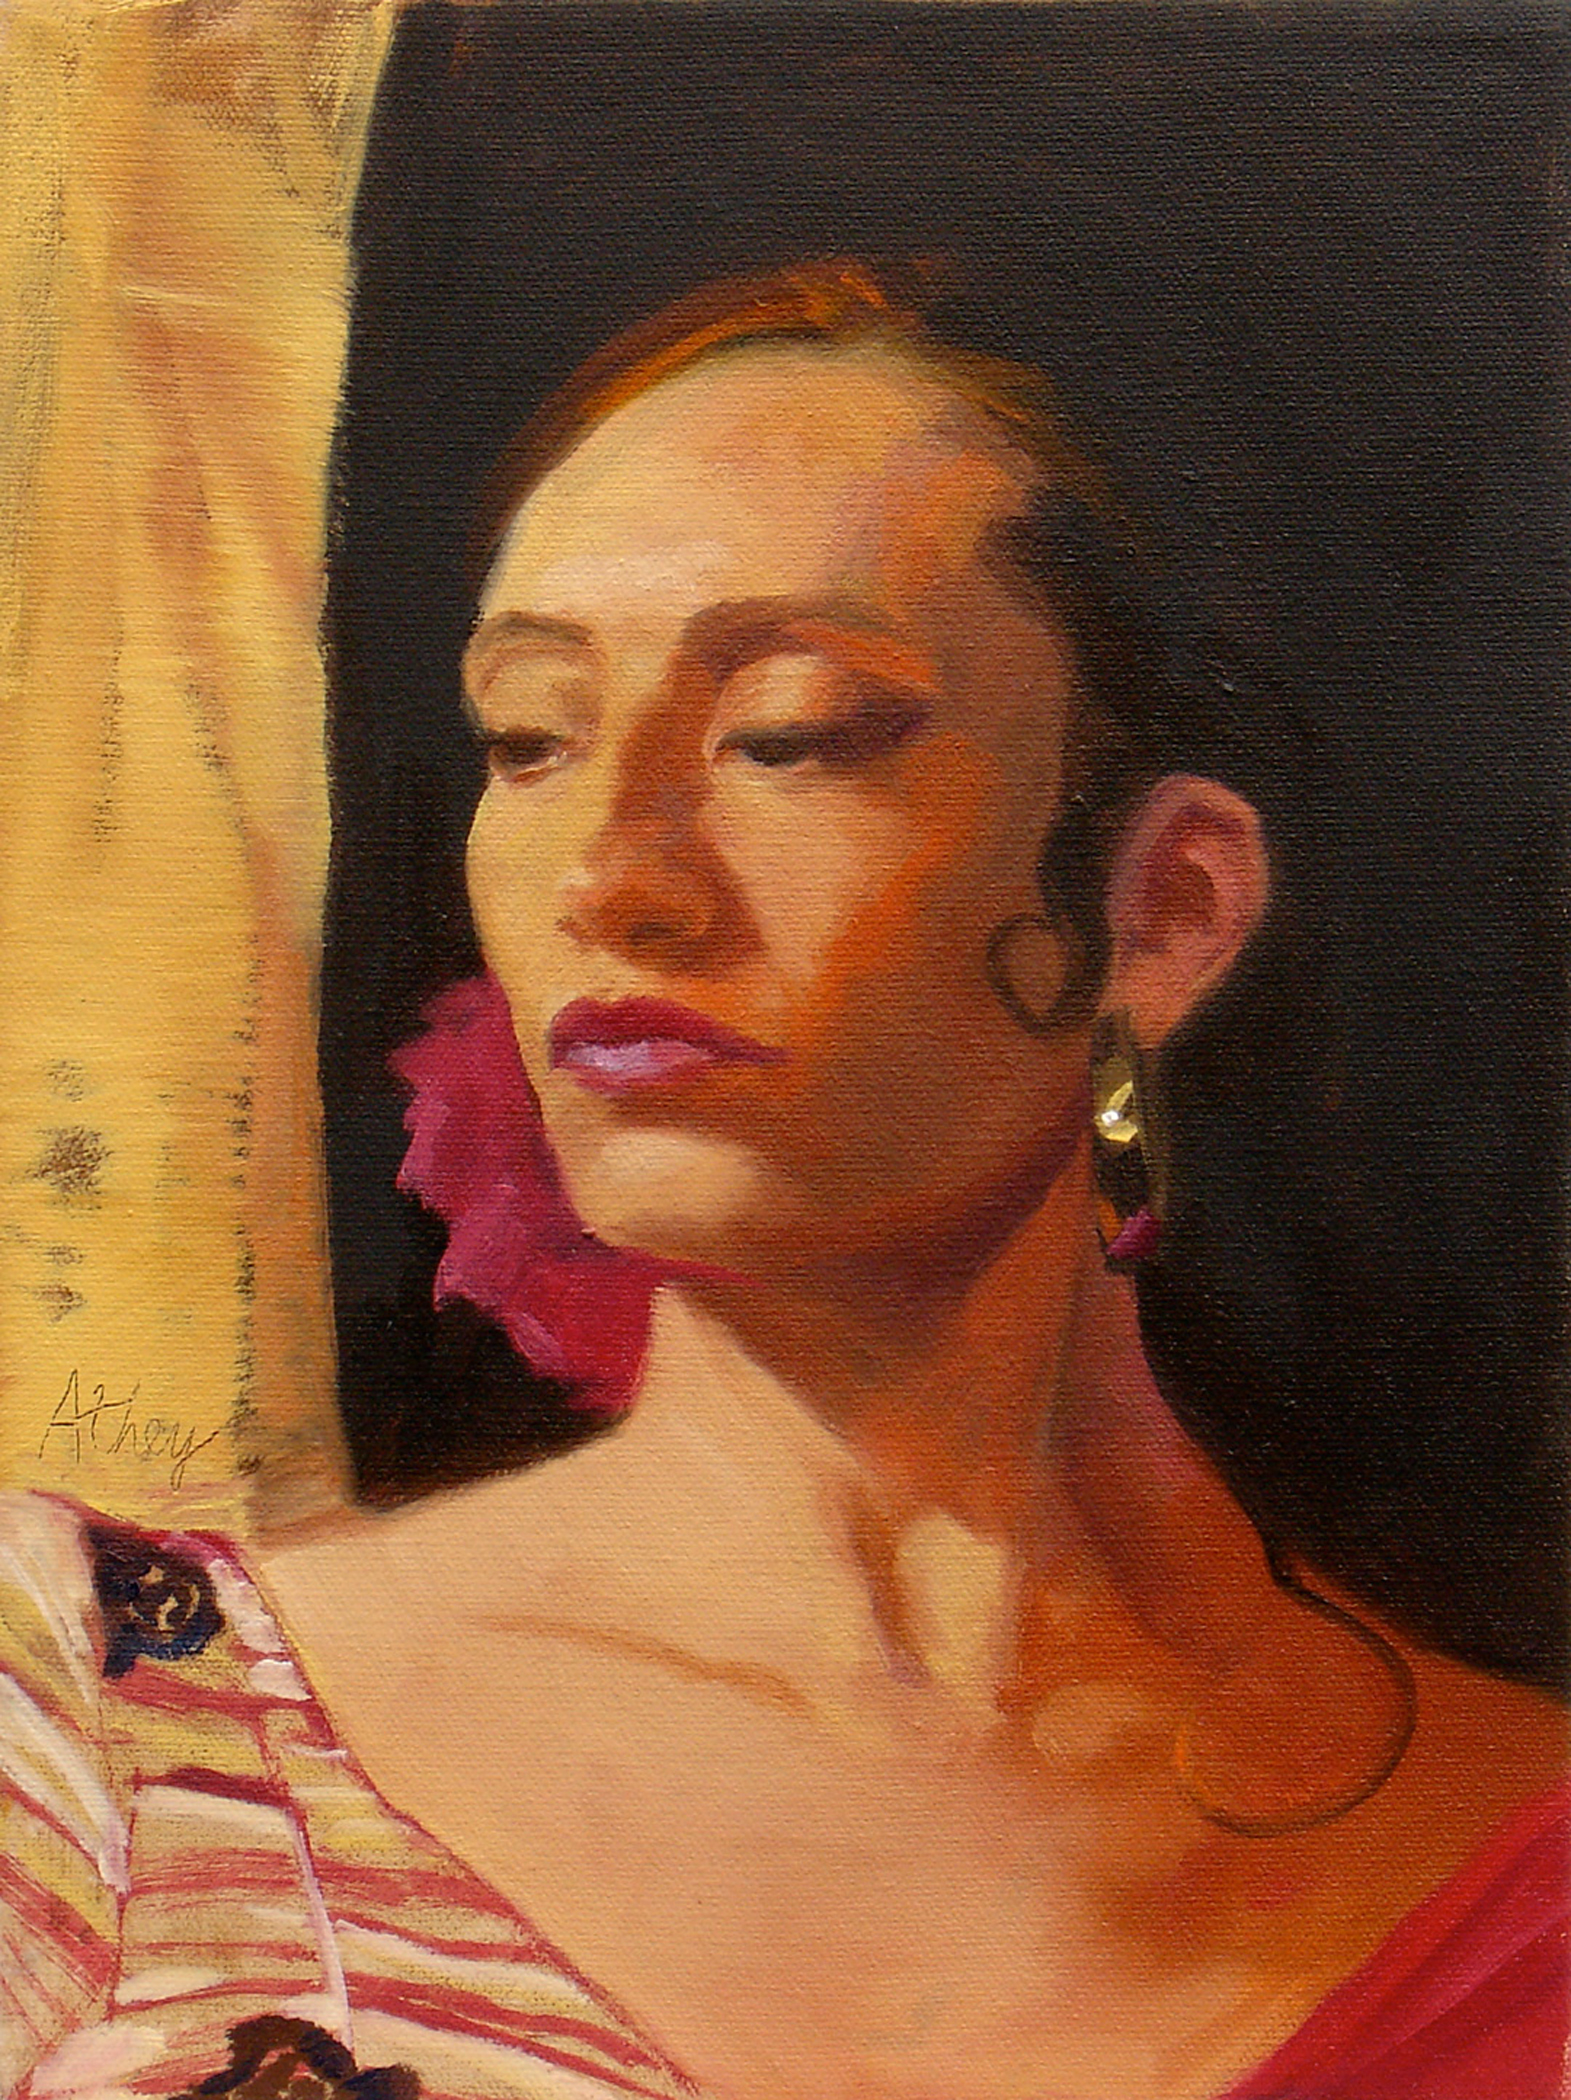 """Flamenco"", 2003, 10x8"", Oil on Board"